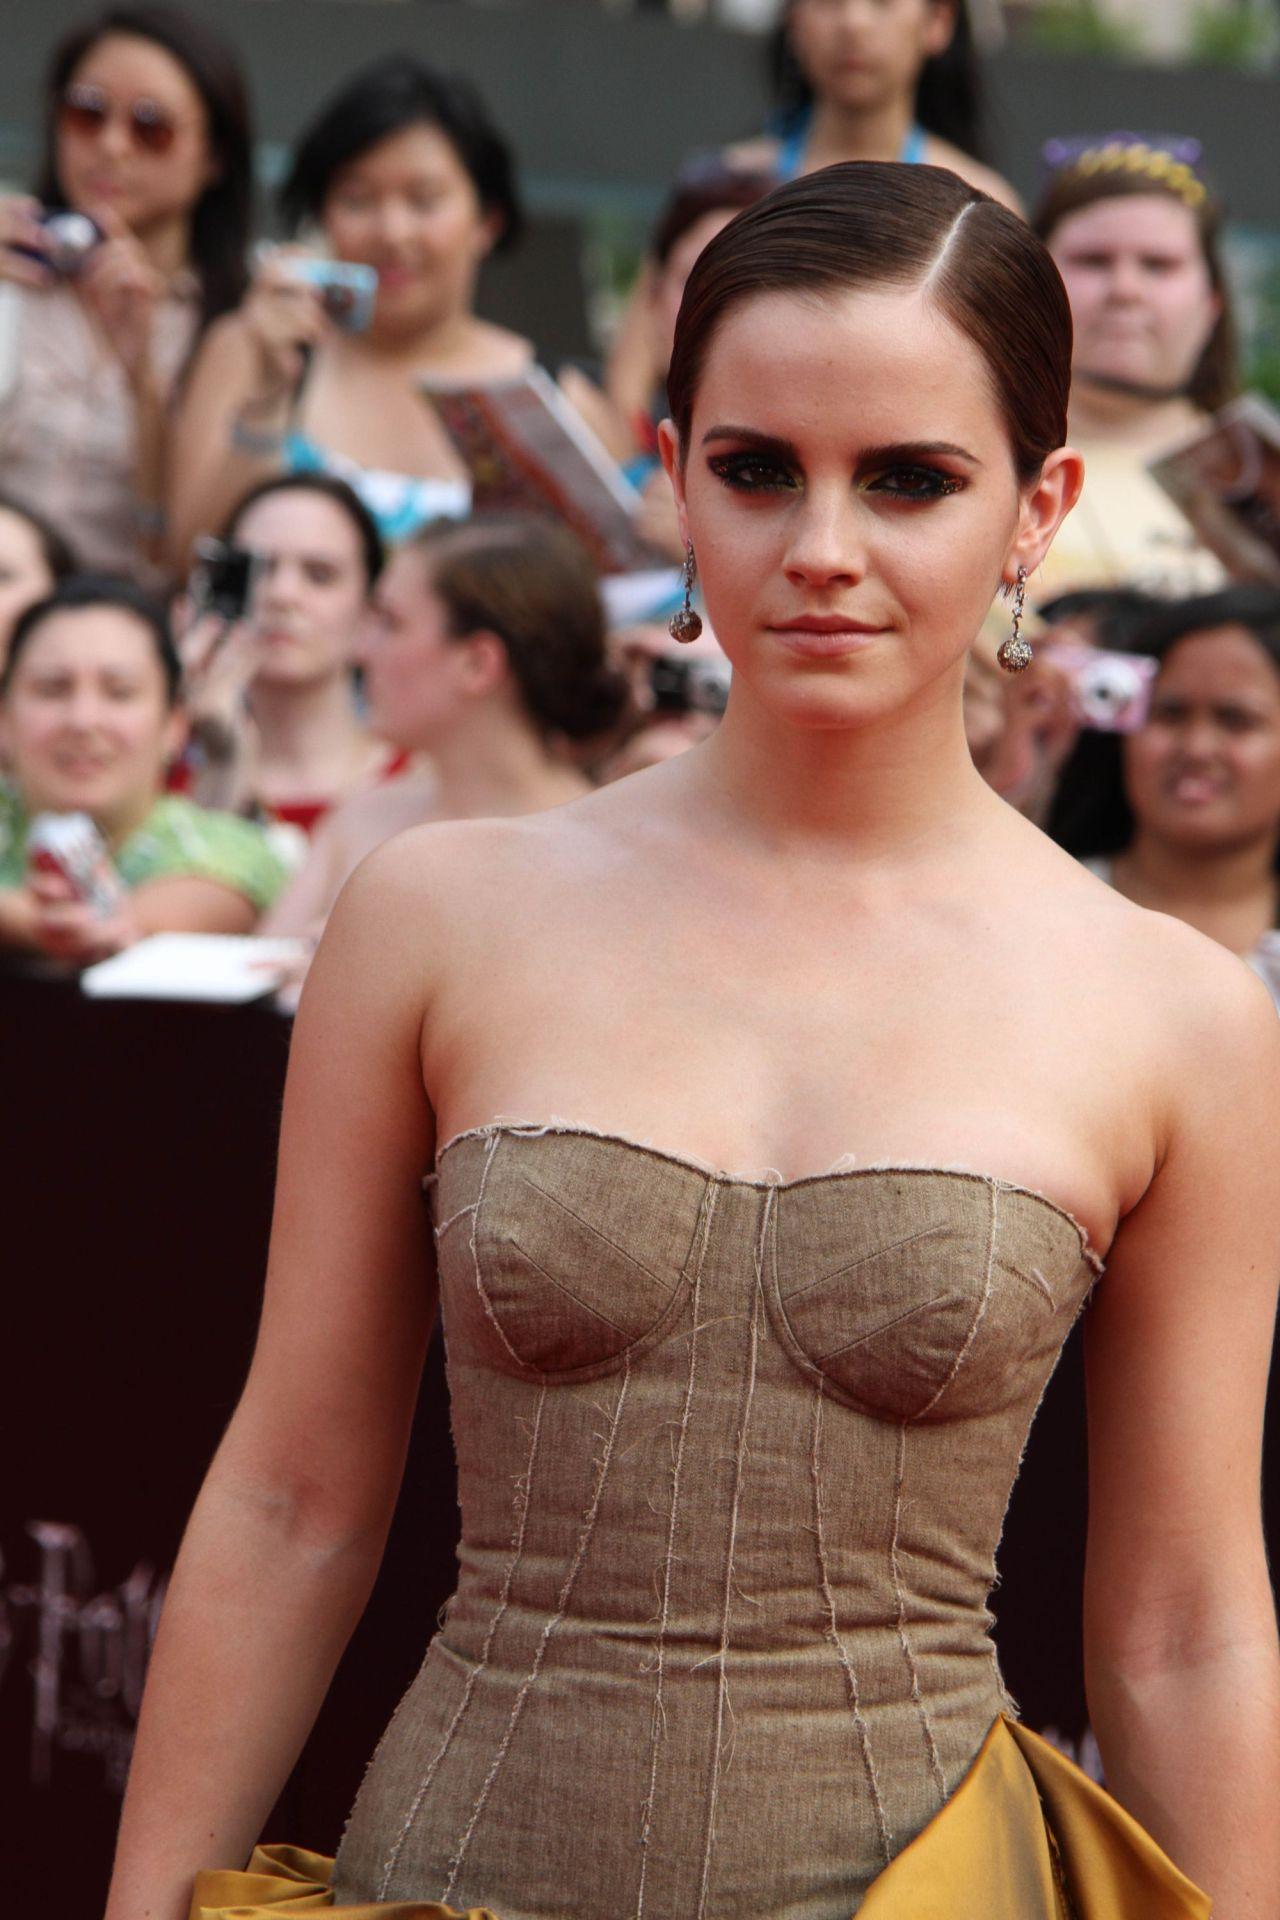 est100 一些攝影(some photos): Emma Watson 艾瑪·沃特森/ 艾瑪·華森